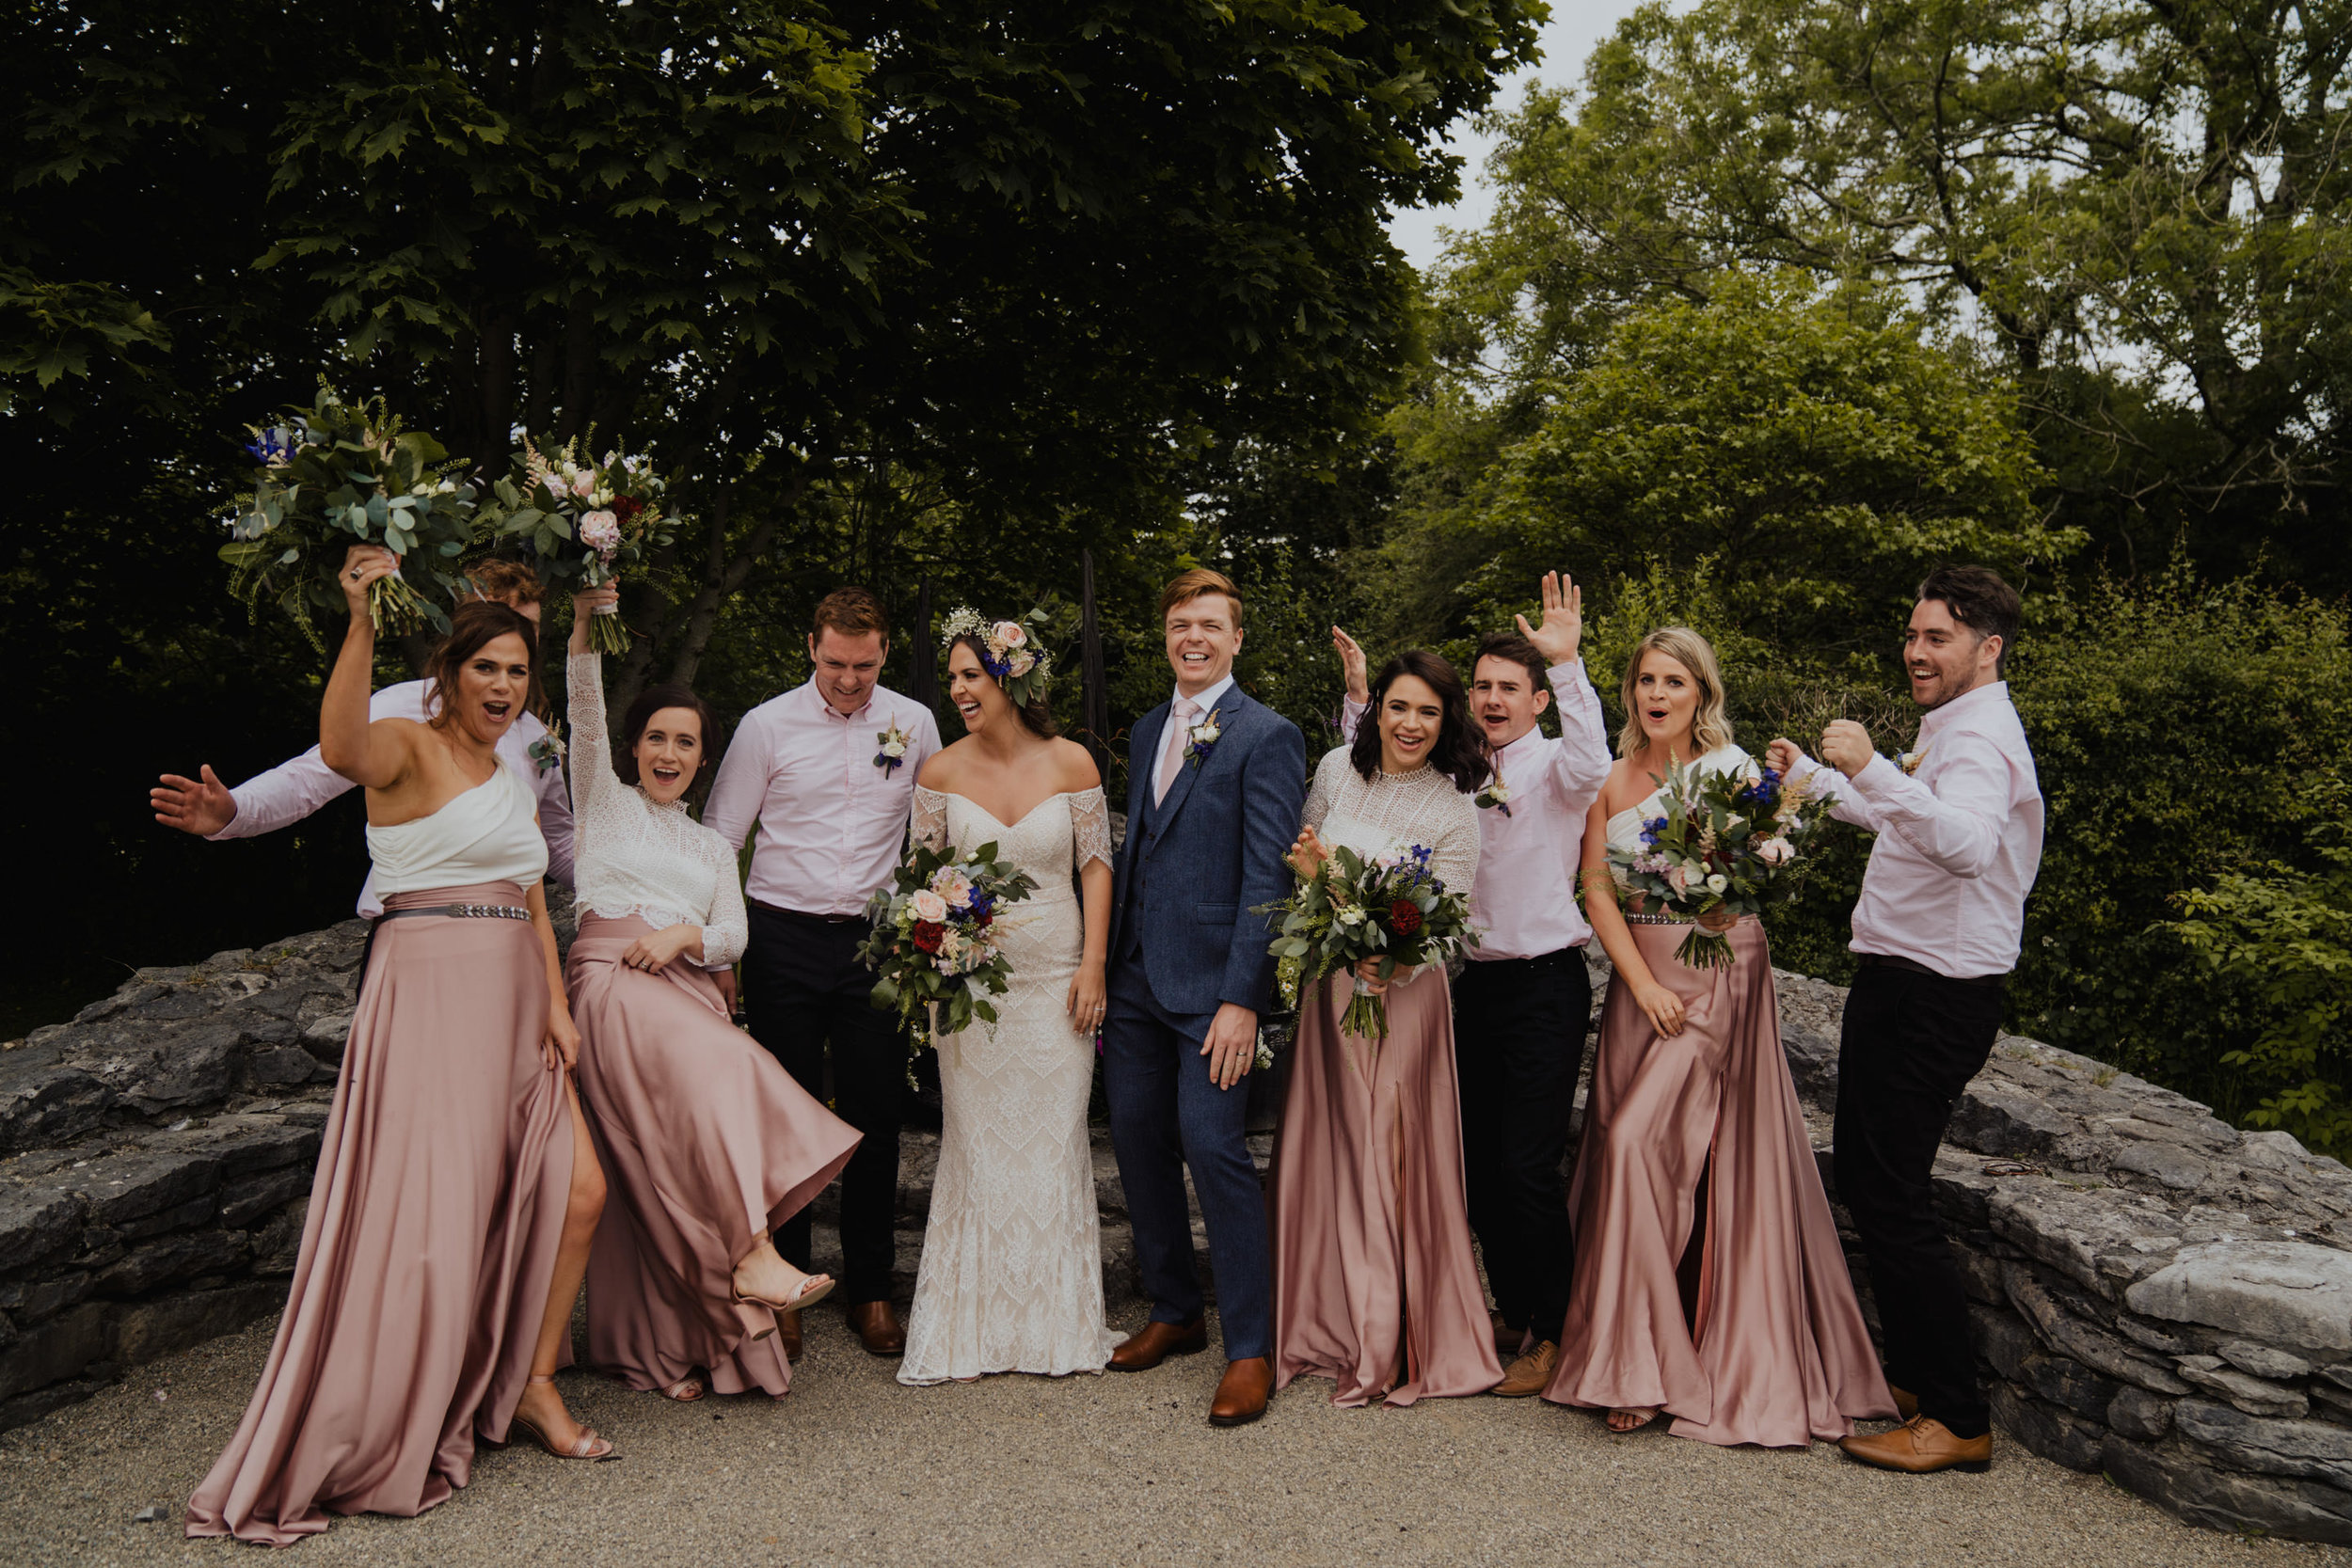 c&j_brigits_garden_galway_wedding_photographer_livia_figueiredo_29.jpg